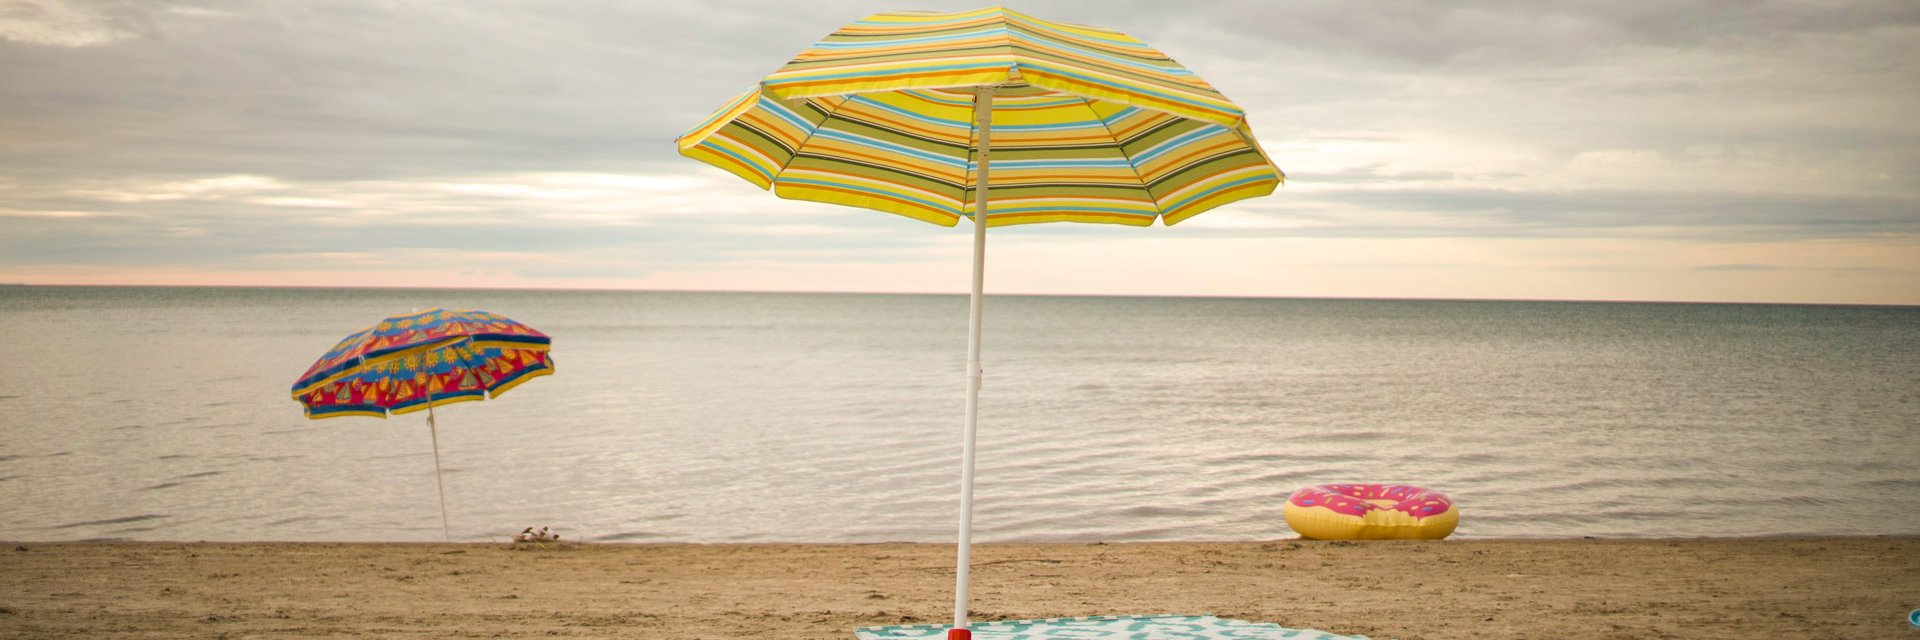 Séjour plage à Wasaga Beach